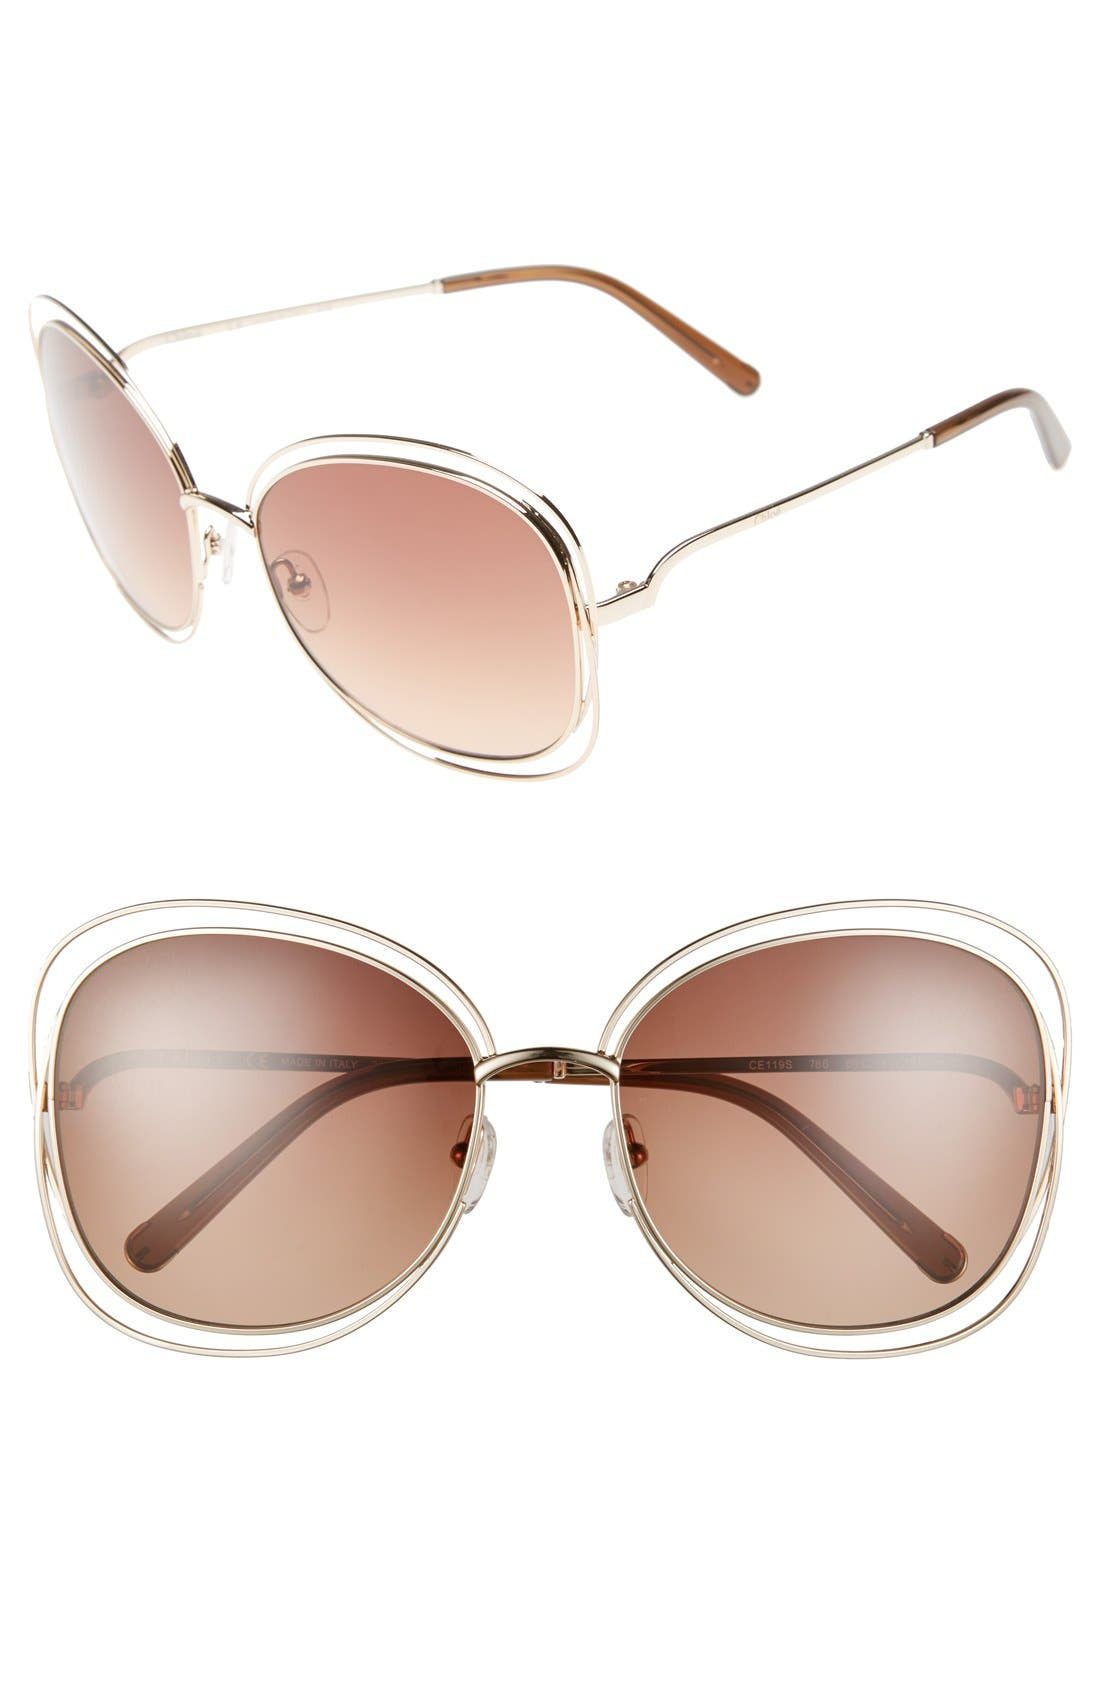 CHLOÉ Carlina 60mm Gradient Les Sunglasses, Main, color, ROSE GOLD/ BROWN